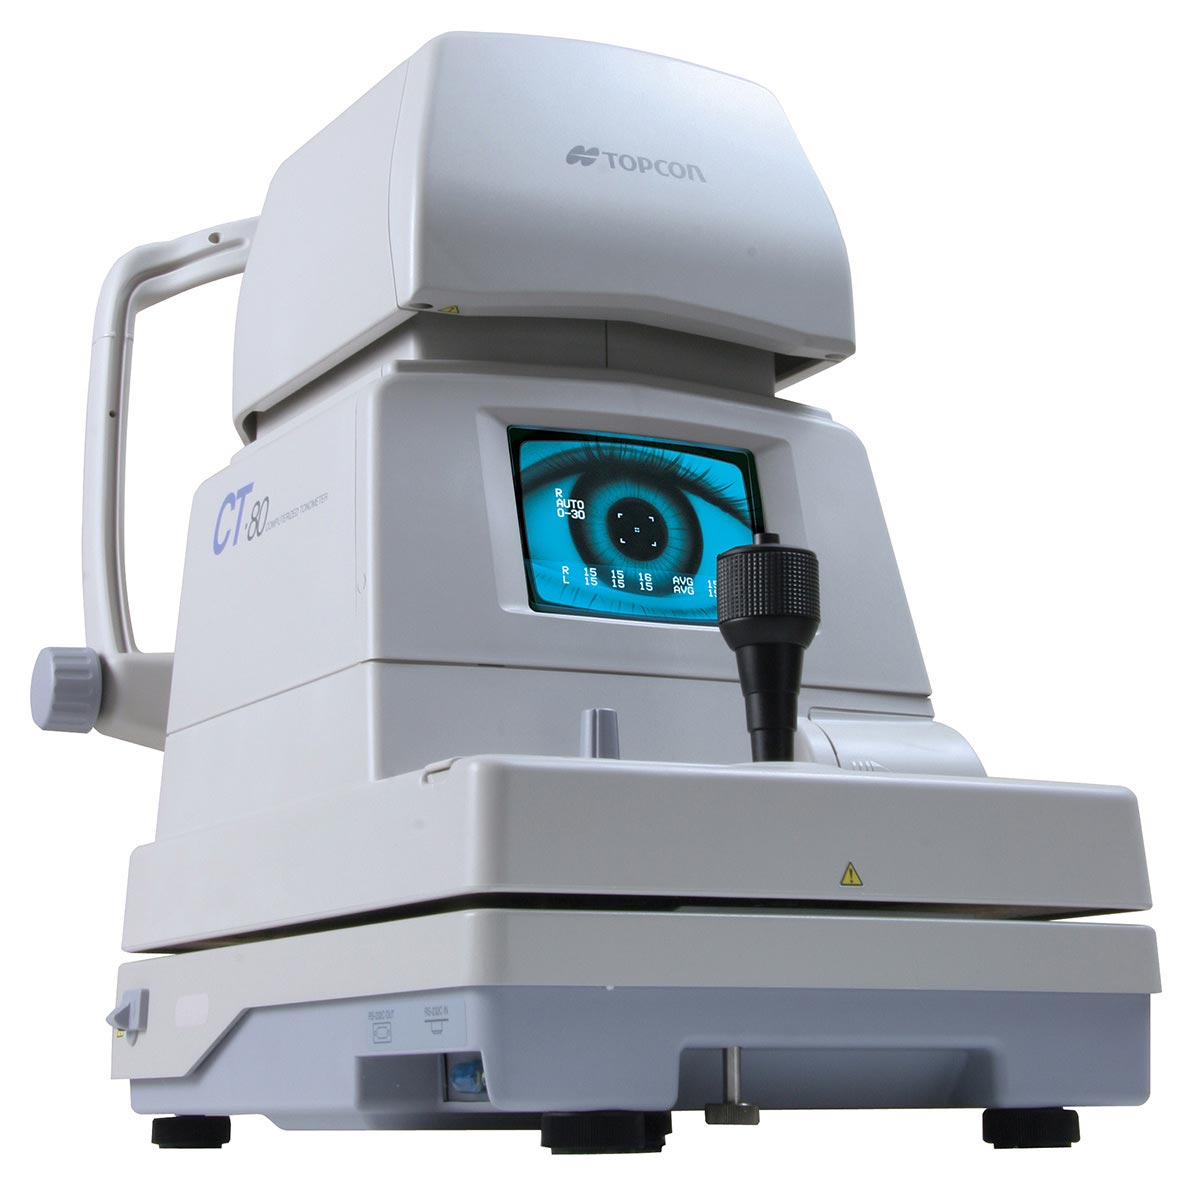 Dual Sensor System Measures High-level Intraocular Pressure